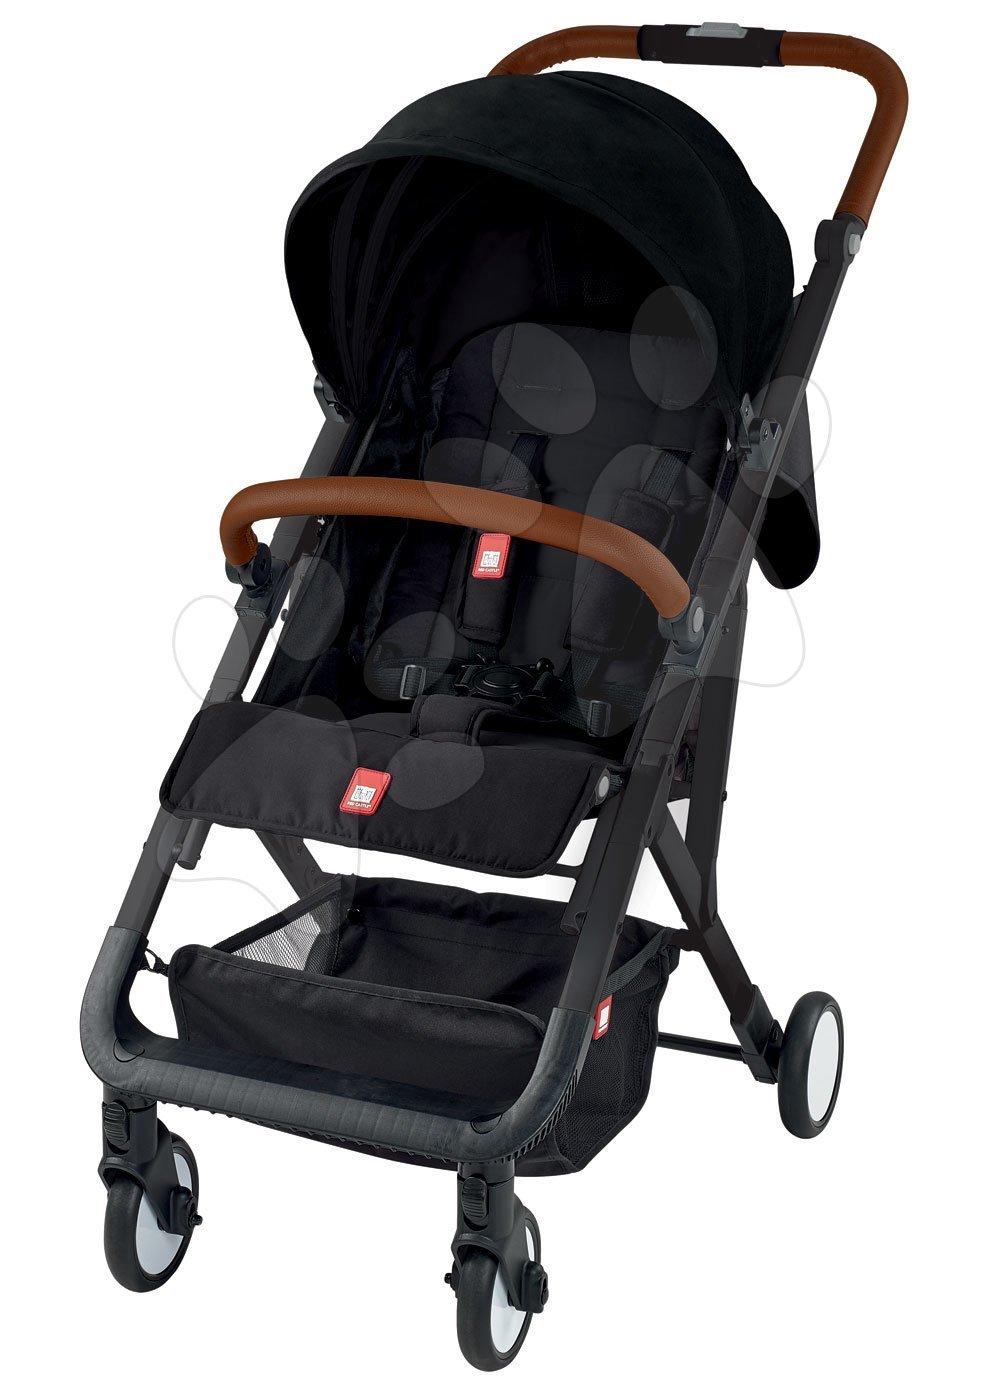 Športový kočík CityLink® III Red Castle skladací, s čiernou konštrukciou a 5-bodovým bezpečnostným pásom od 0 mes